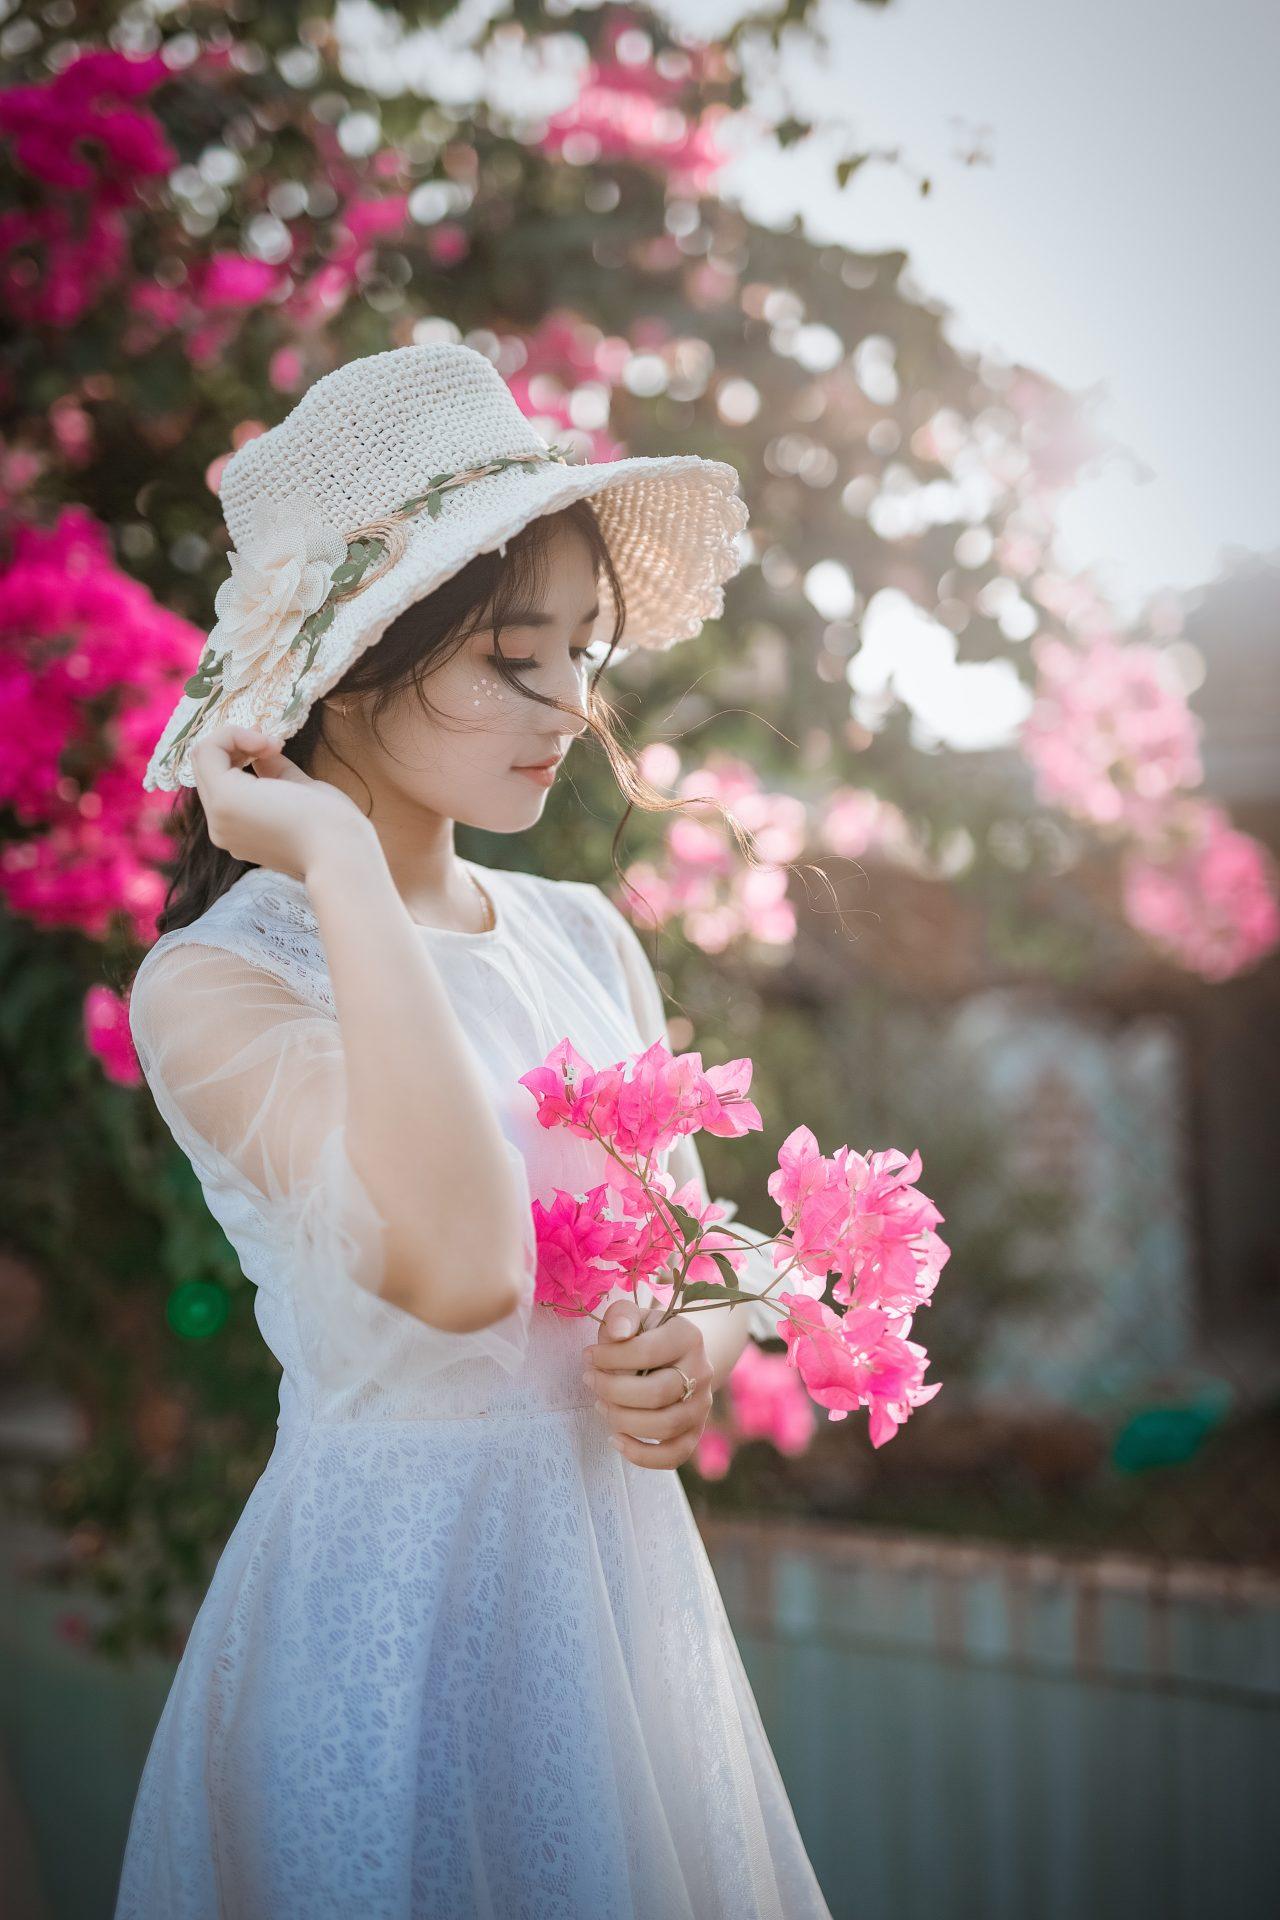 woman wearing sun hat and white dress holding pink 1382734 1 - お腹のたるみ原因はこの2つ!改善して服を綺麗に着こなす!